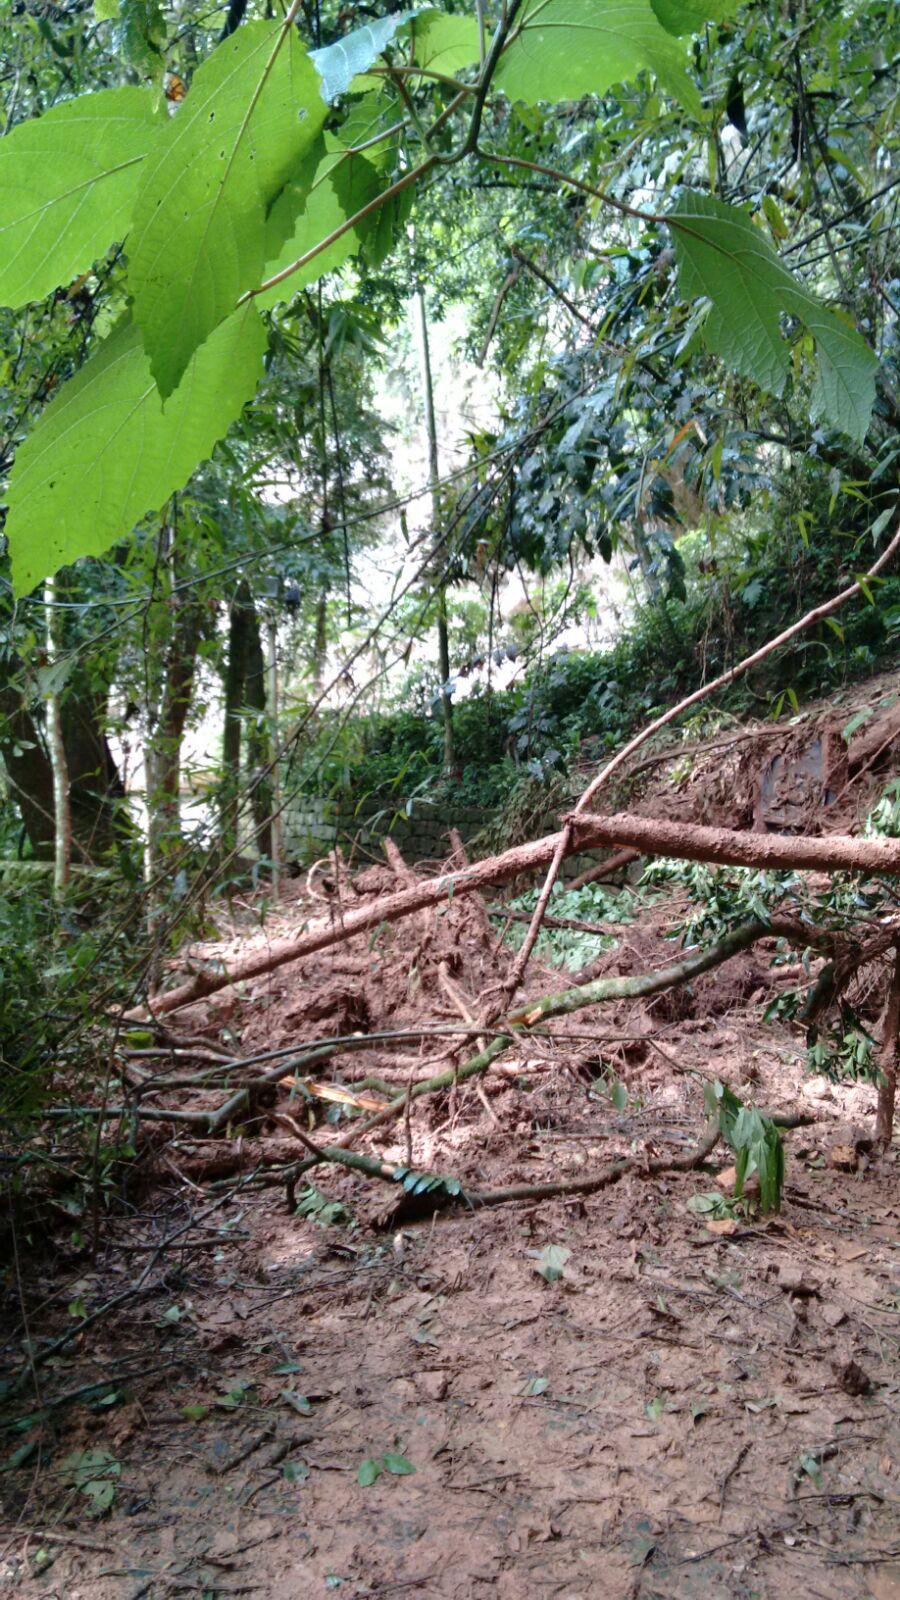 Deslizamento de terra interdita Gruta em Ituporanga